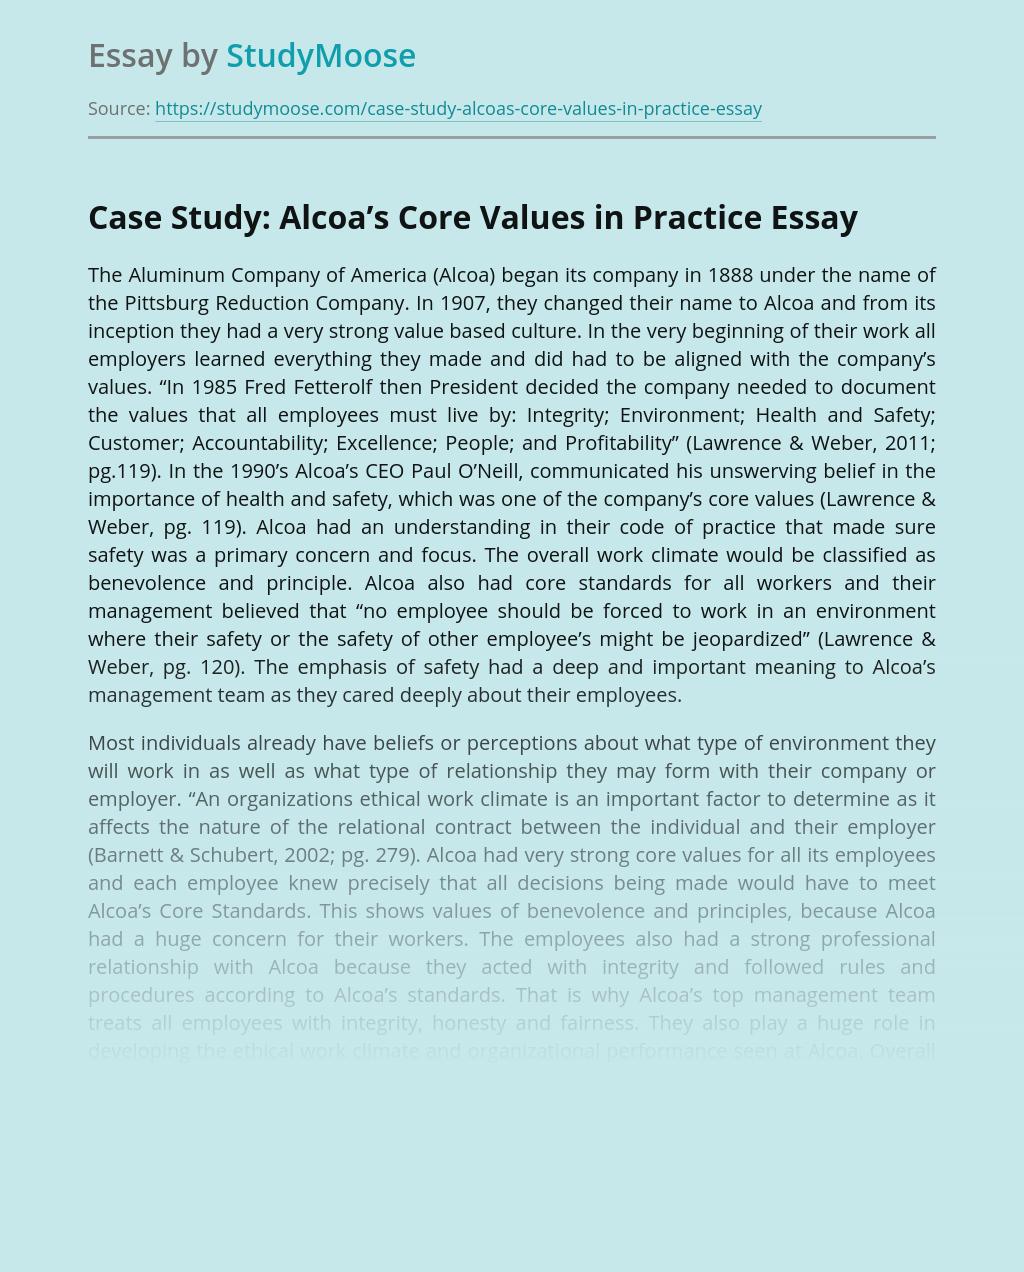 Case Study: Alcoa's Core Values in Practice